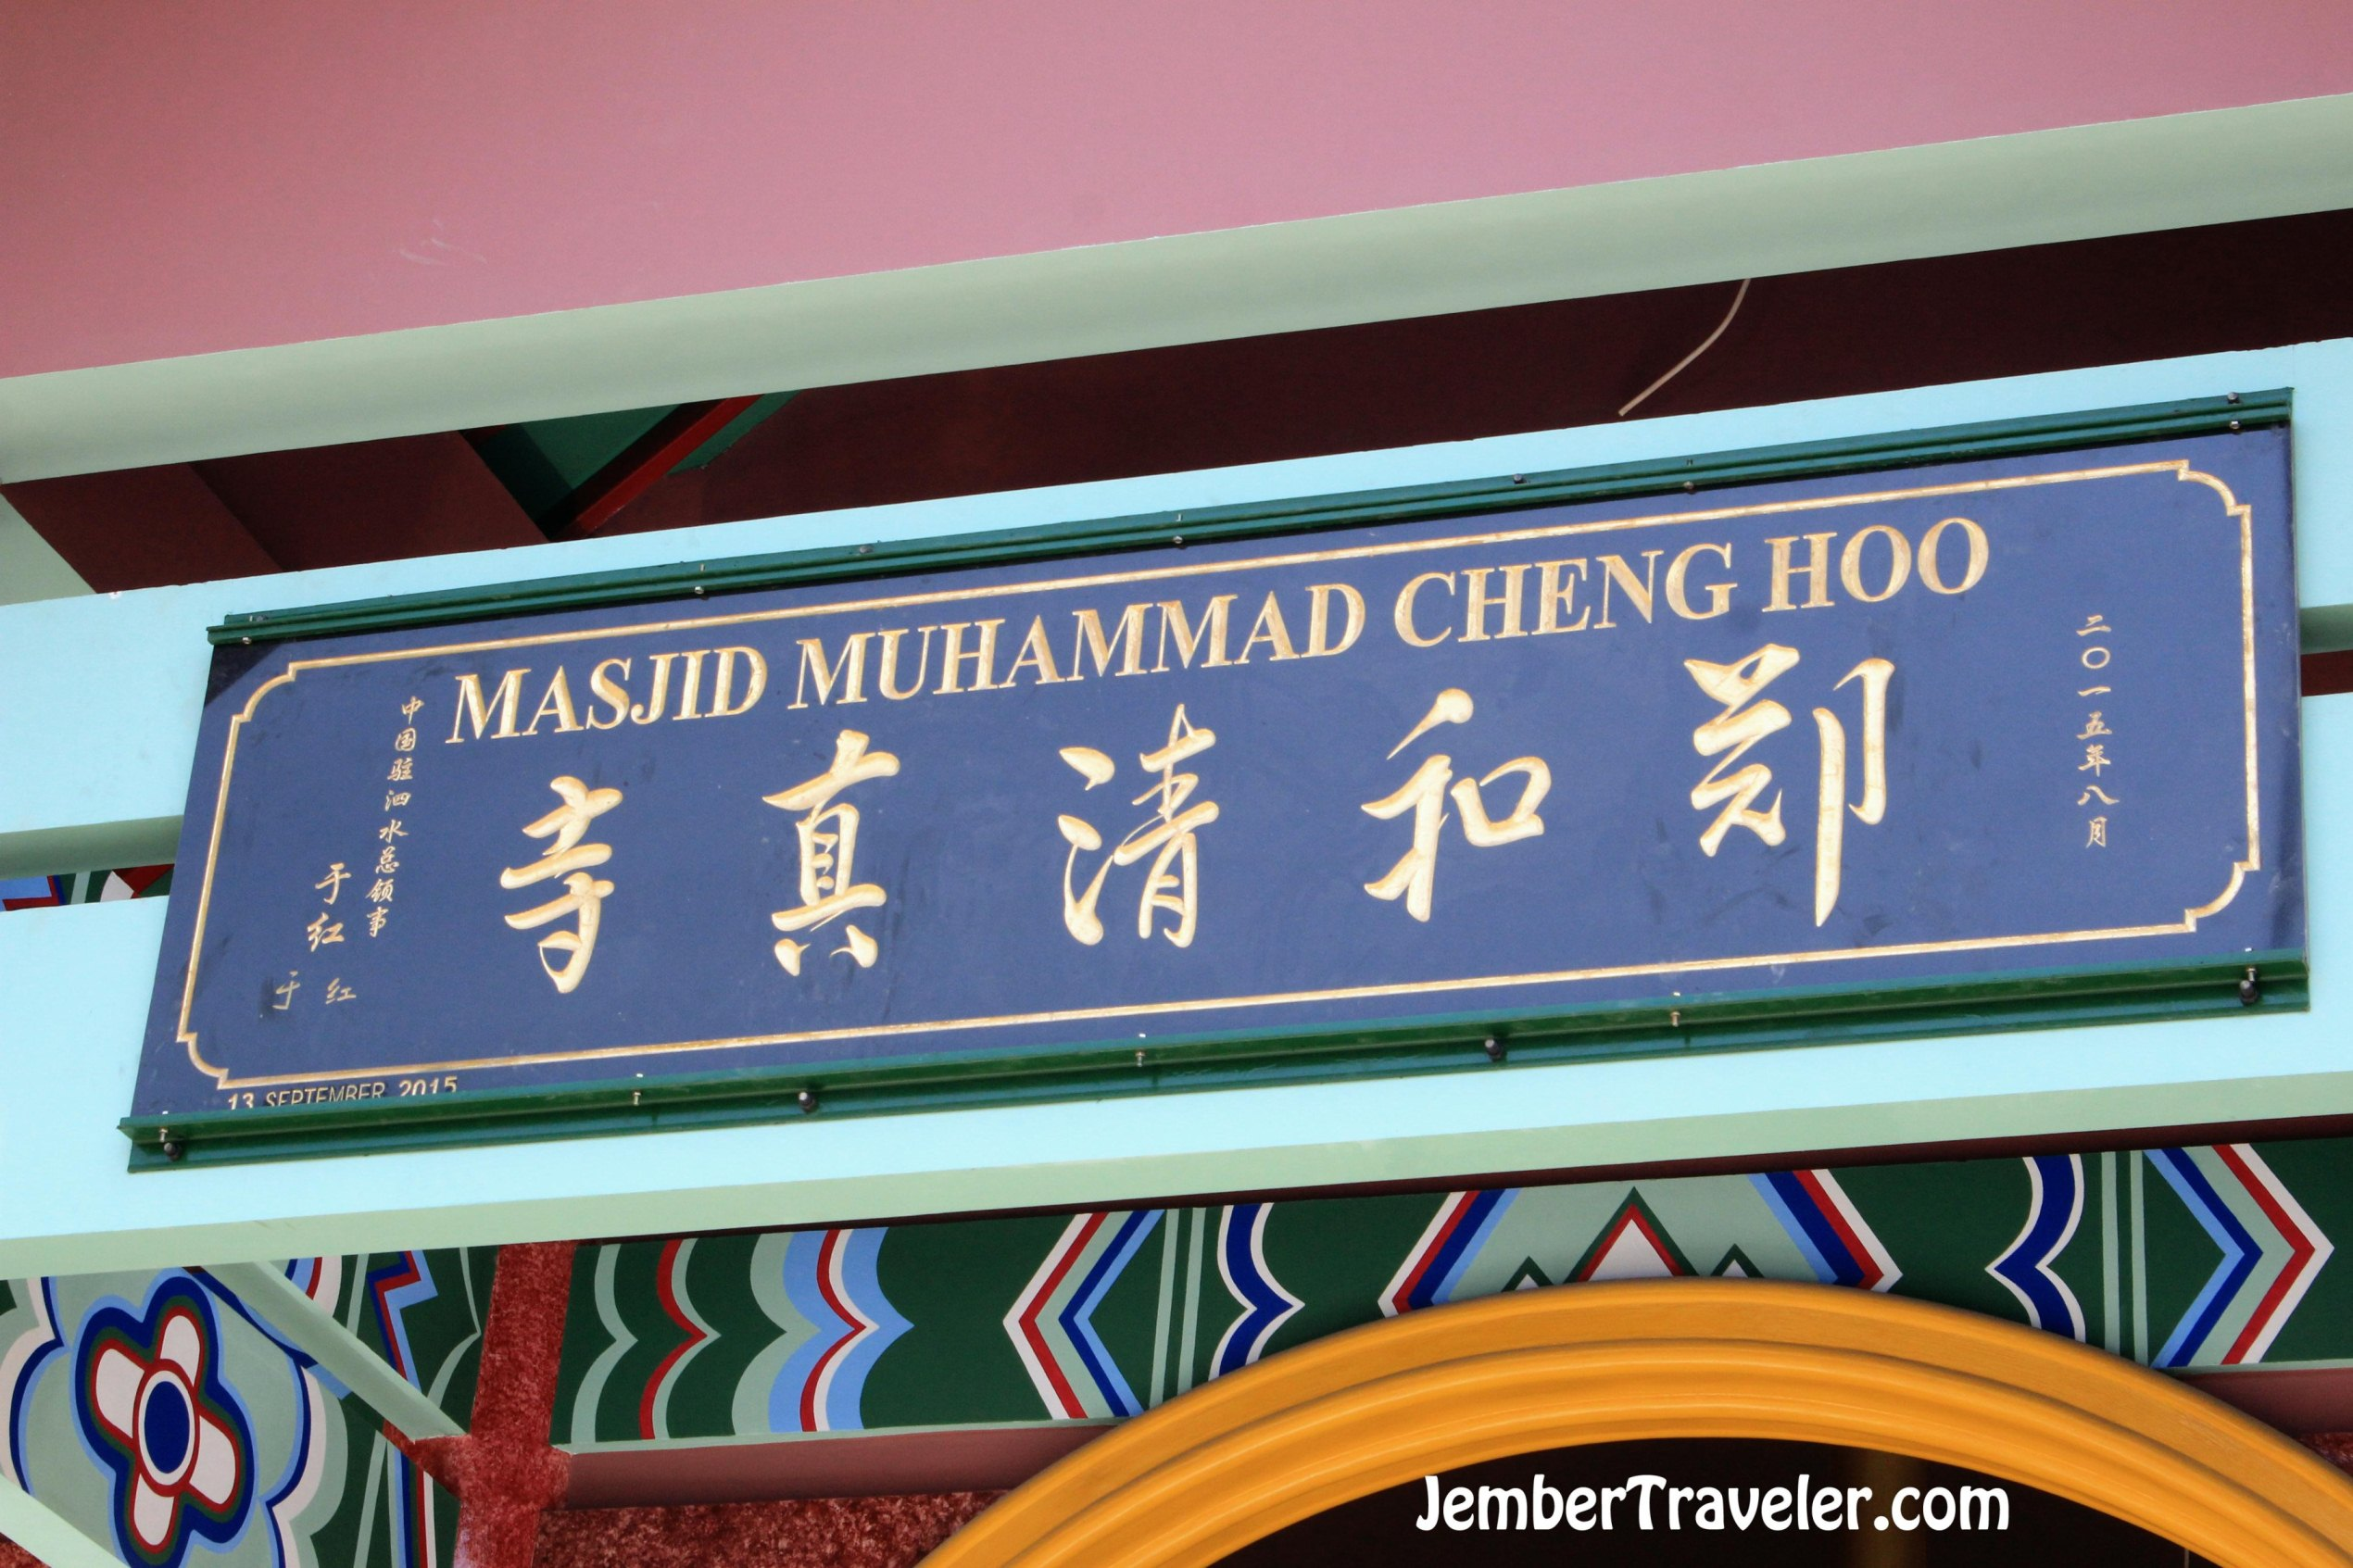 Masjid Muhammad Cheng Ho Jember Traveler Papan Nama Museum Huruf